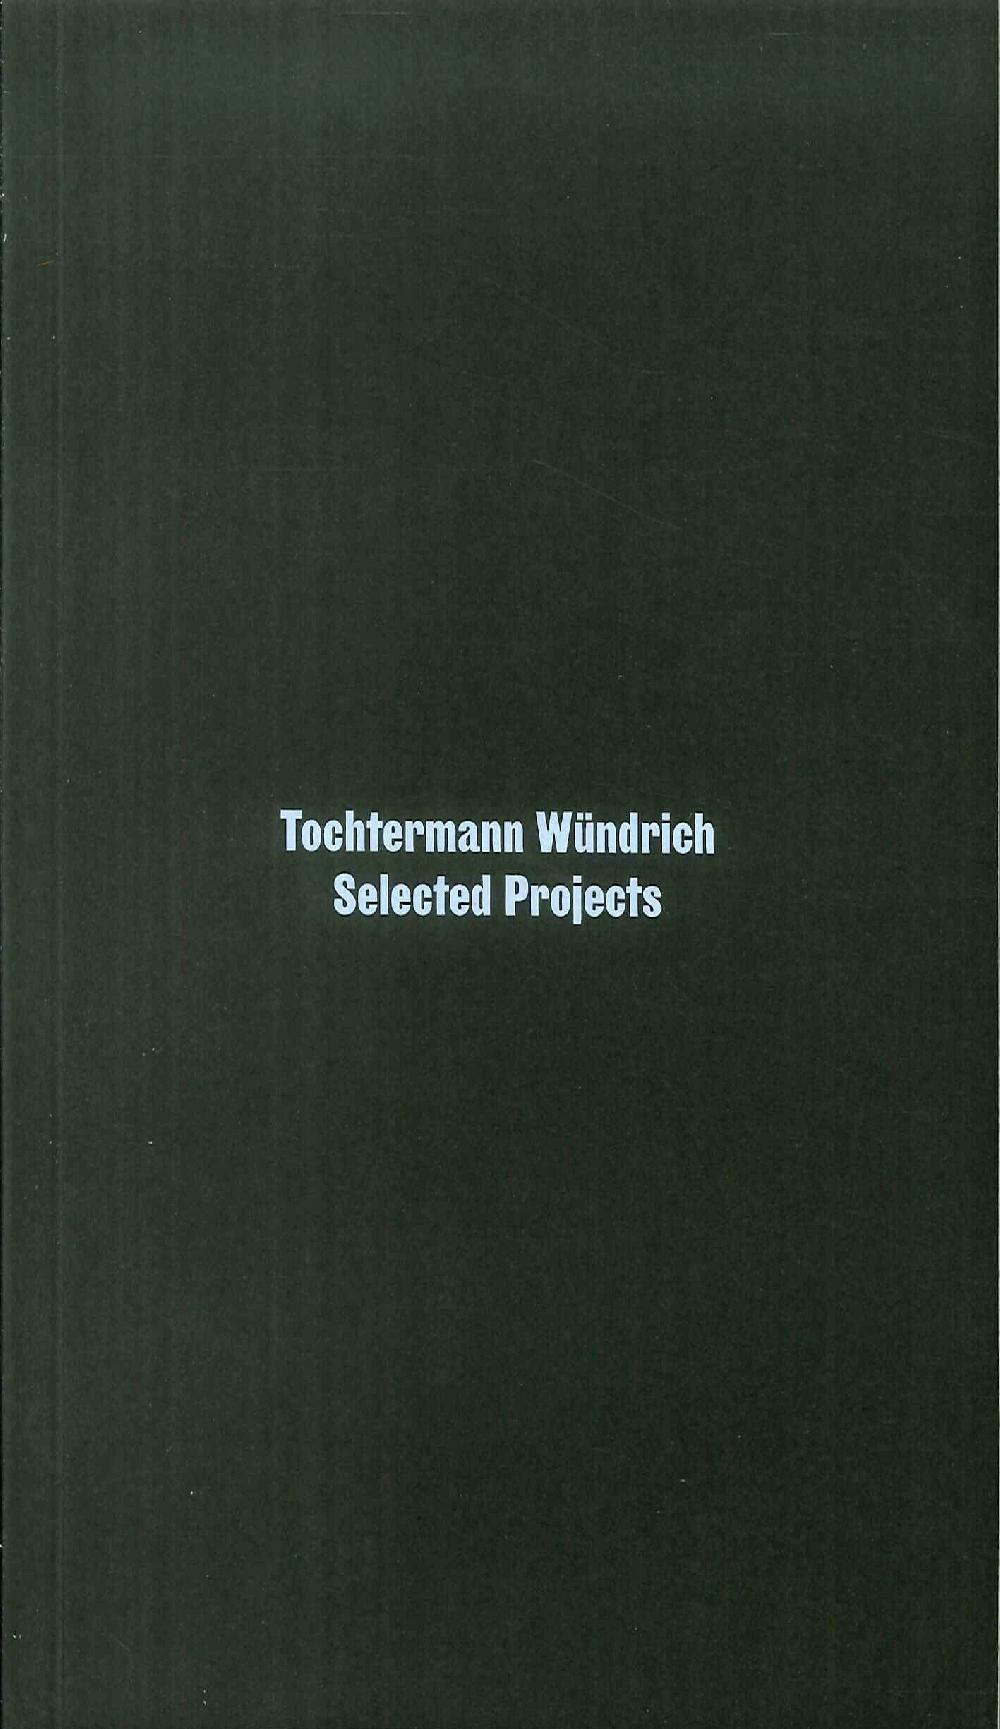 Tochtermann Wündrich. Selected Projects